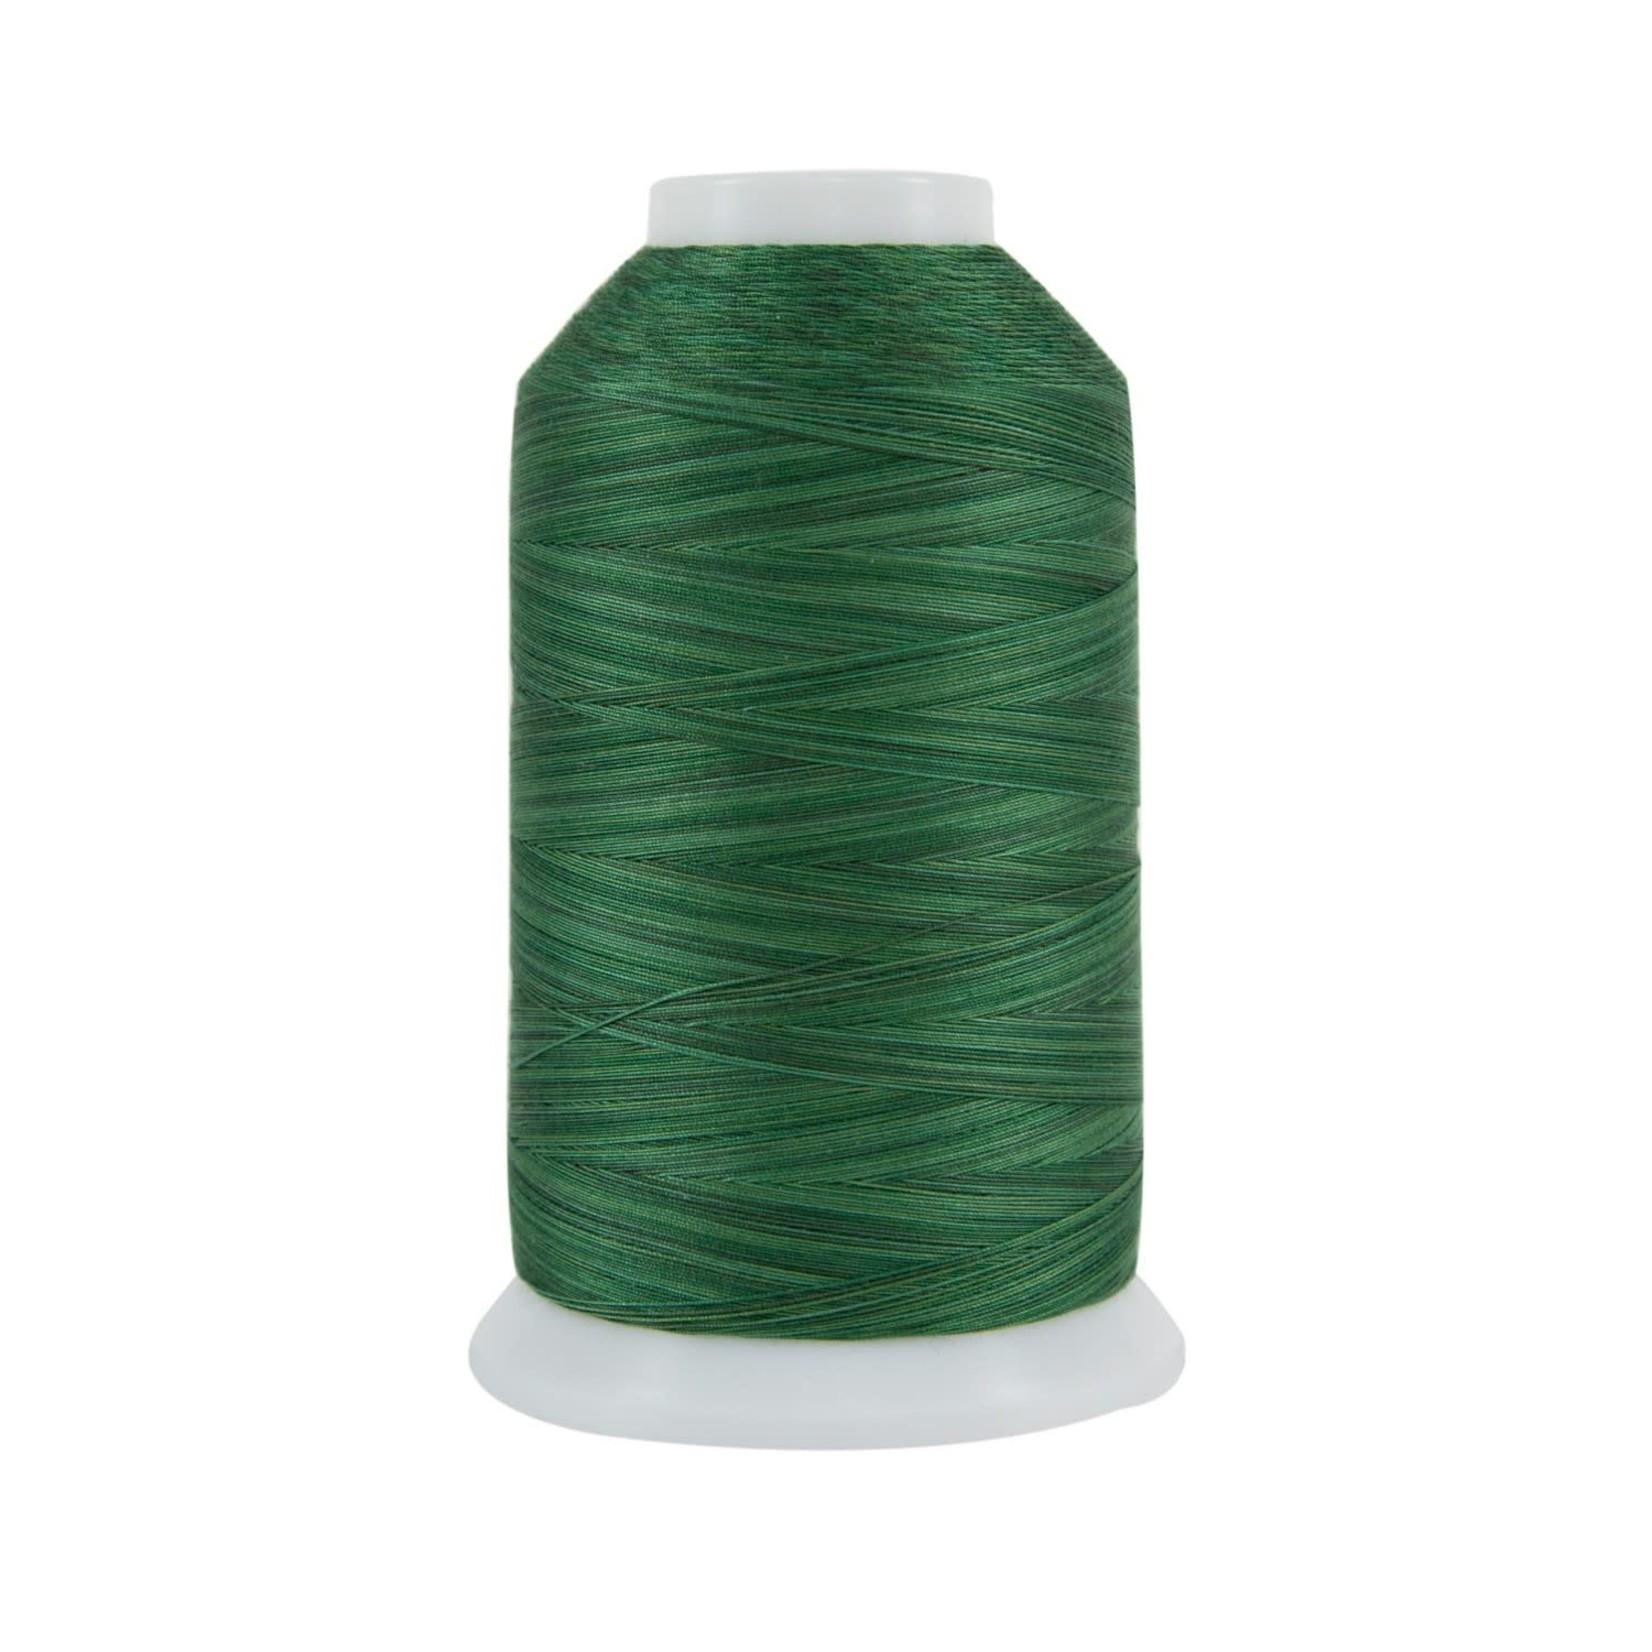 Superior Threads King Tut - #40 - 1828 m - 0989 Malachite